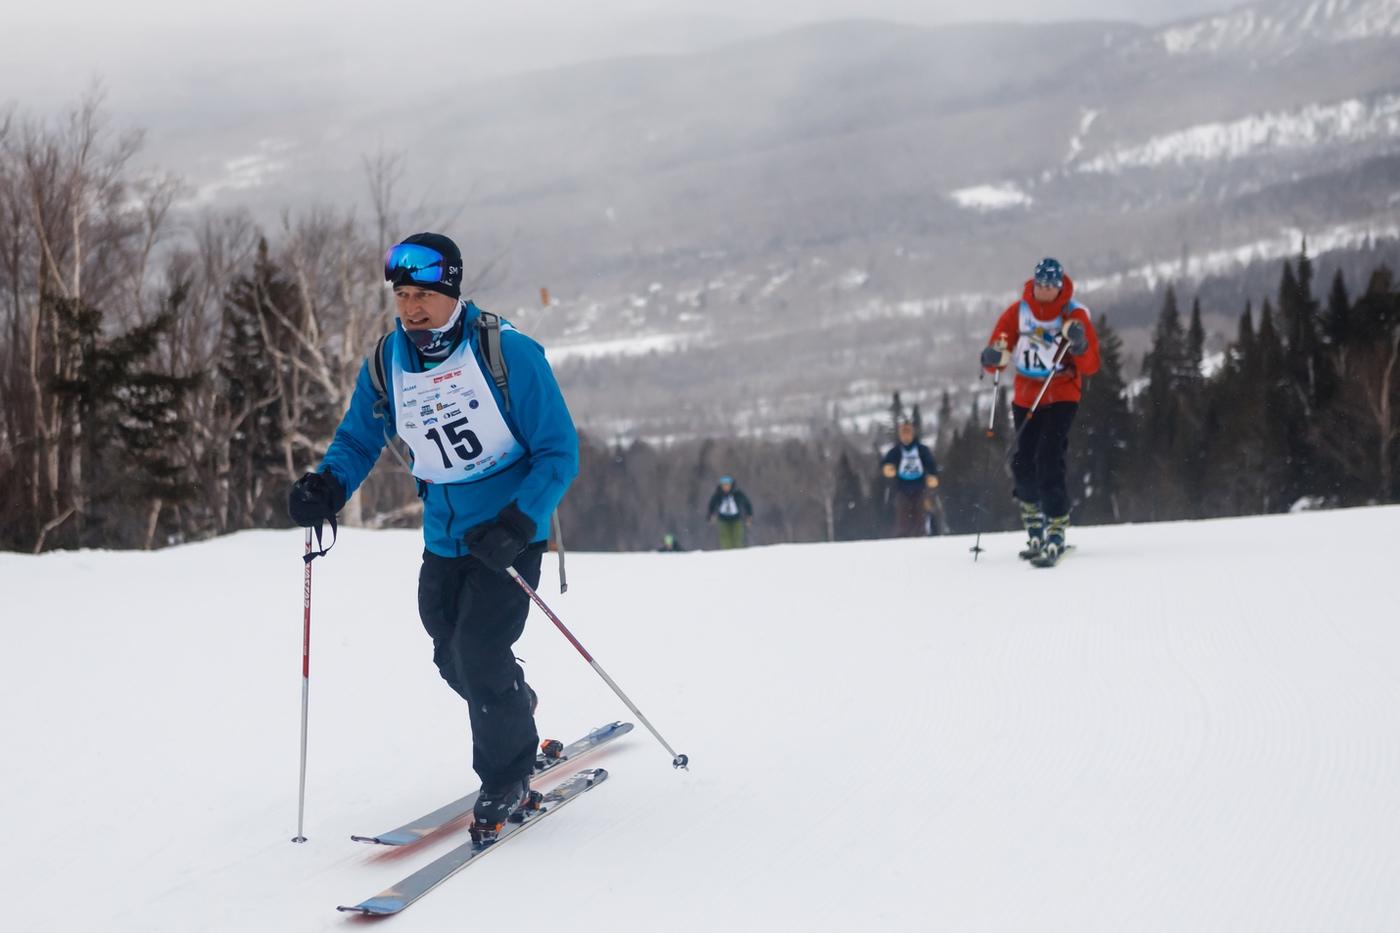 WinterKids Downhill 24 2021 SDP 3768